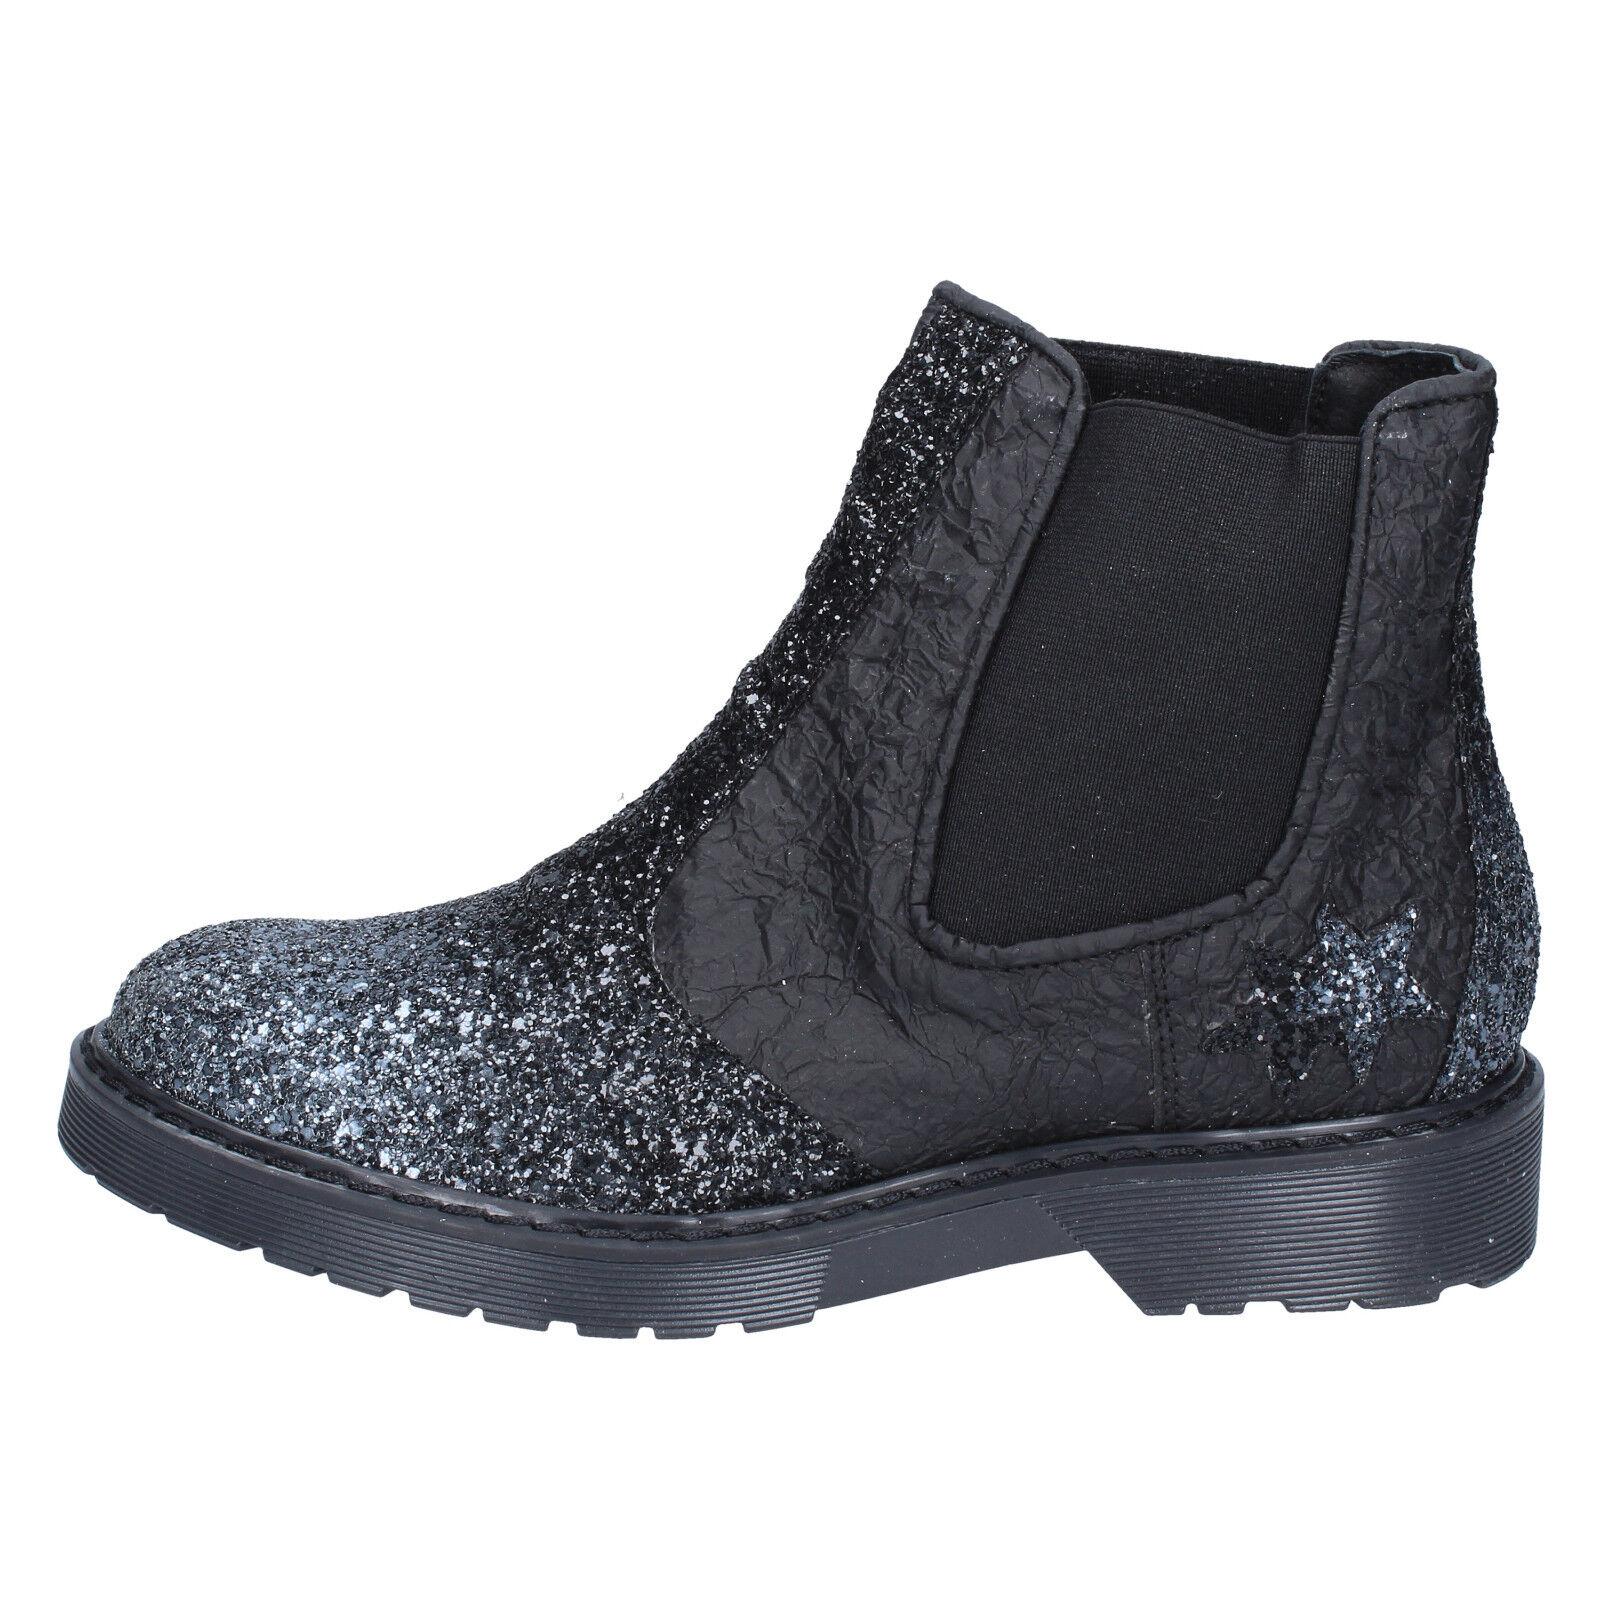 Zapatos señora 2 Star 40 botines negro plata cuero paillettes bx374-40